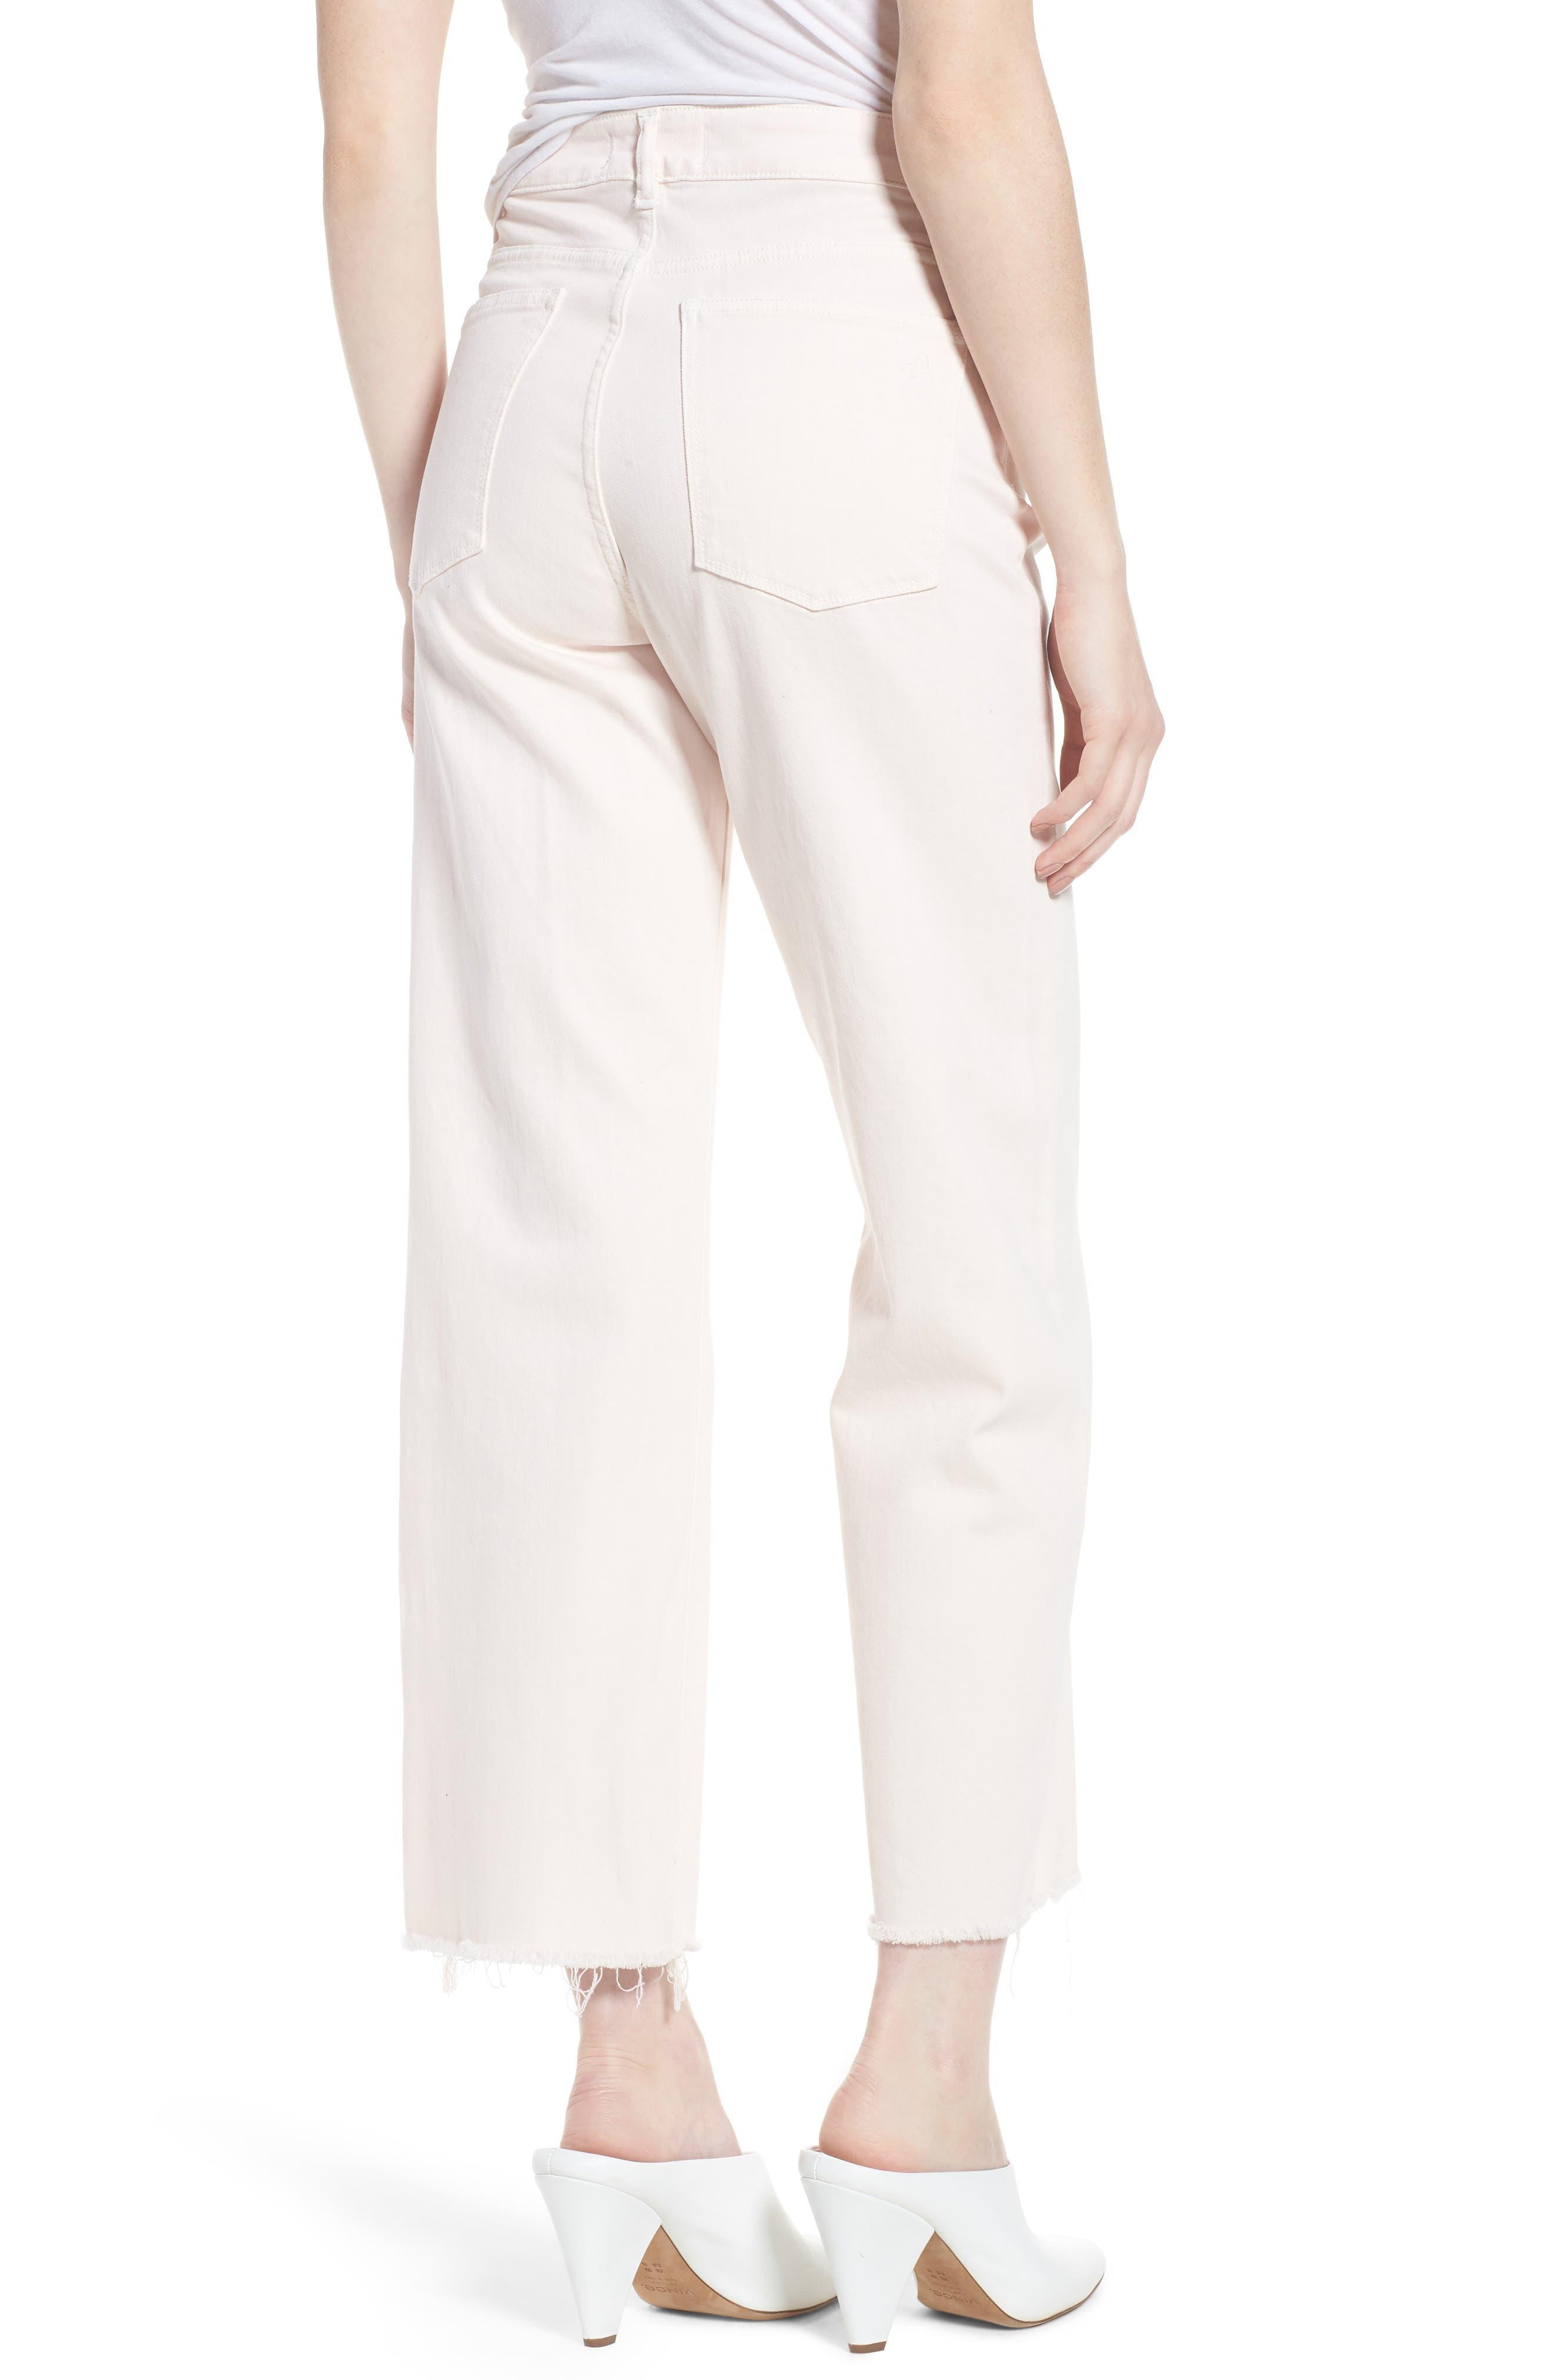 Hepburn Ankle Wide Leg Jeans,                             Alternate thumbnail 2, color,                             651